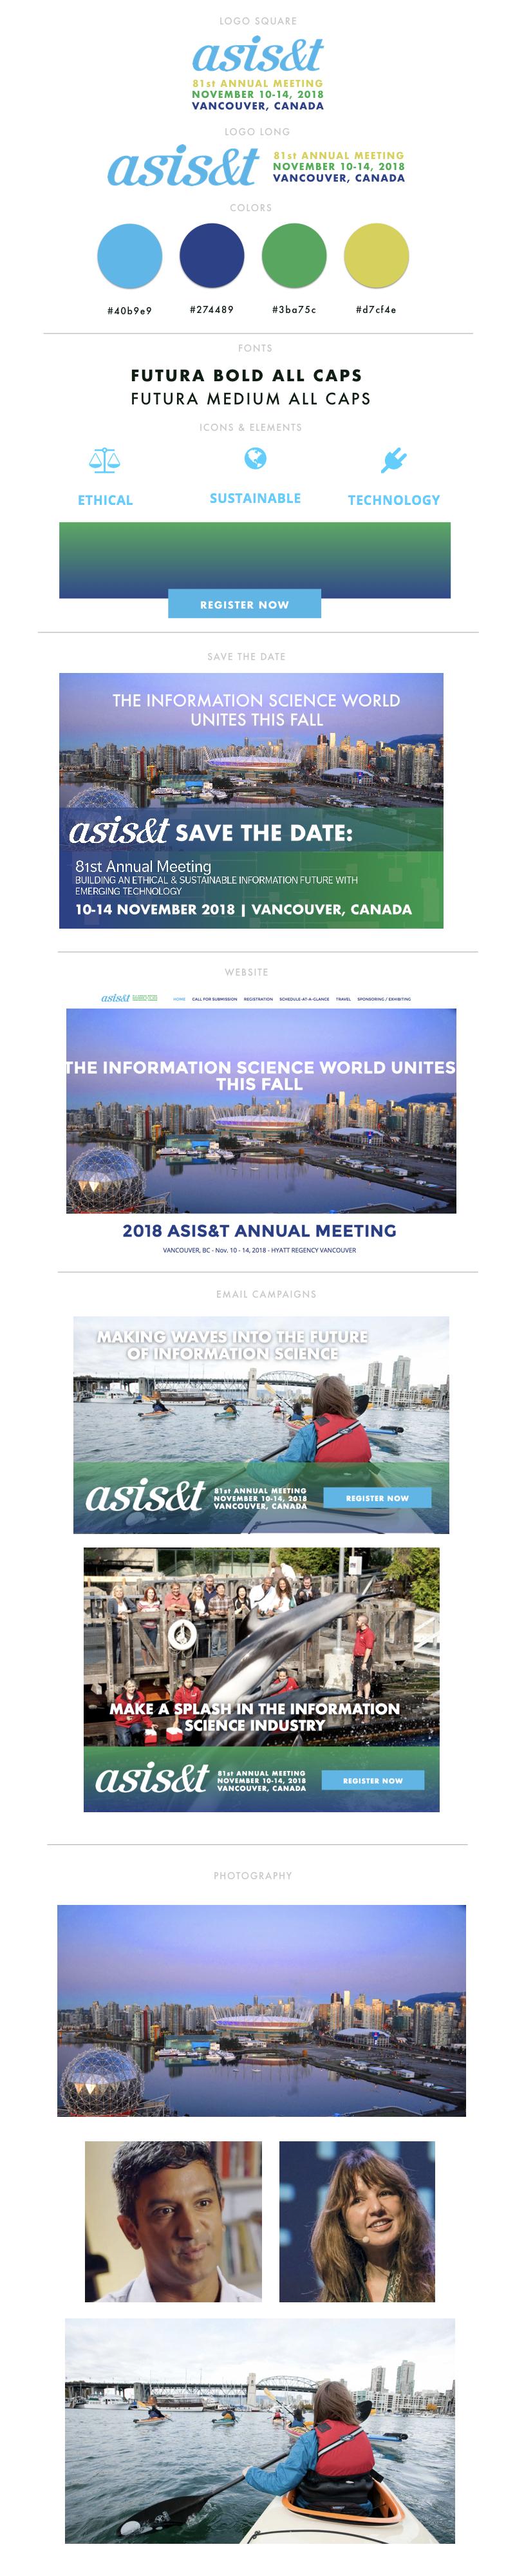 ASIS&T Annual Meeting 2018 Branding.jpeg